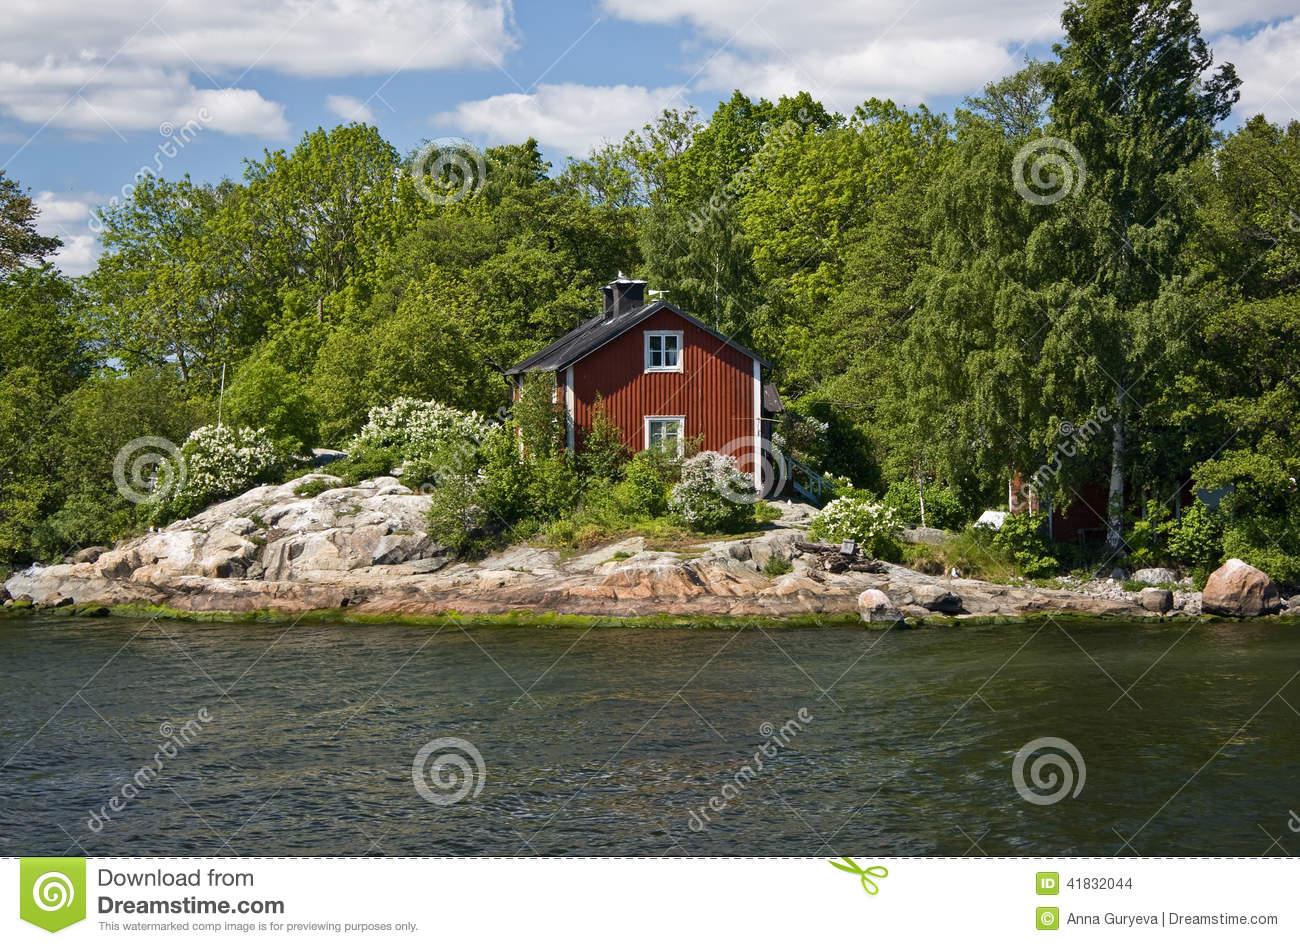 Stockholm Archipelago, Summer House (2) Stock Photo.